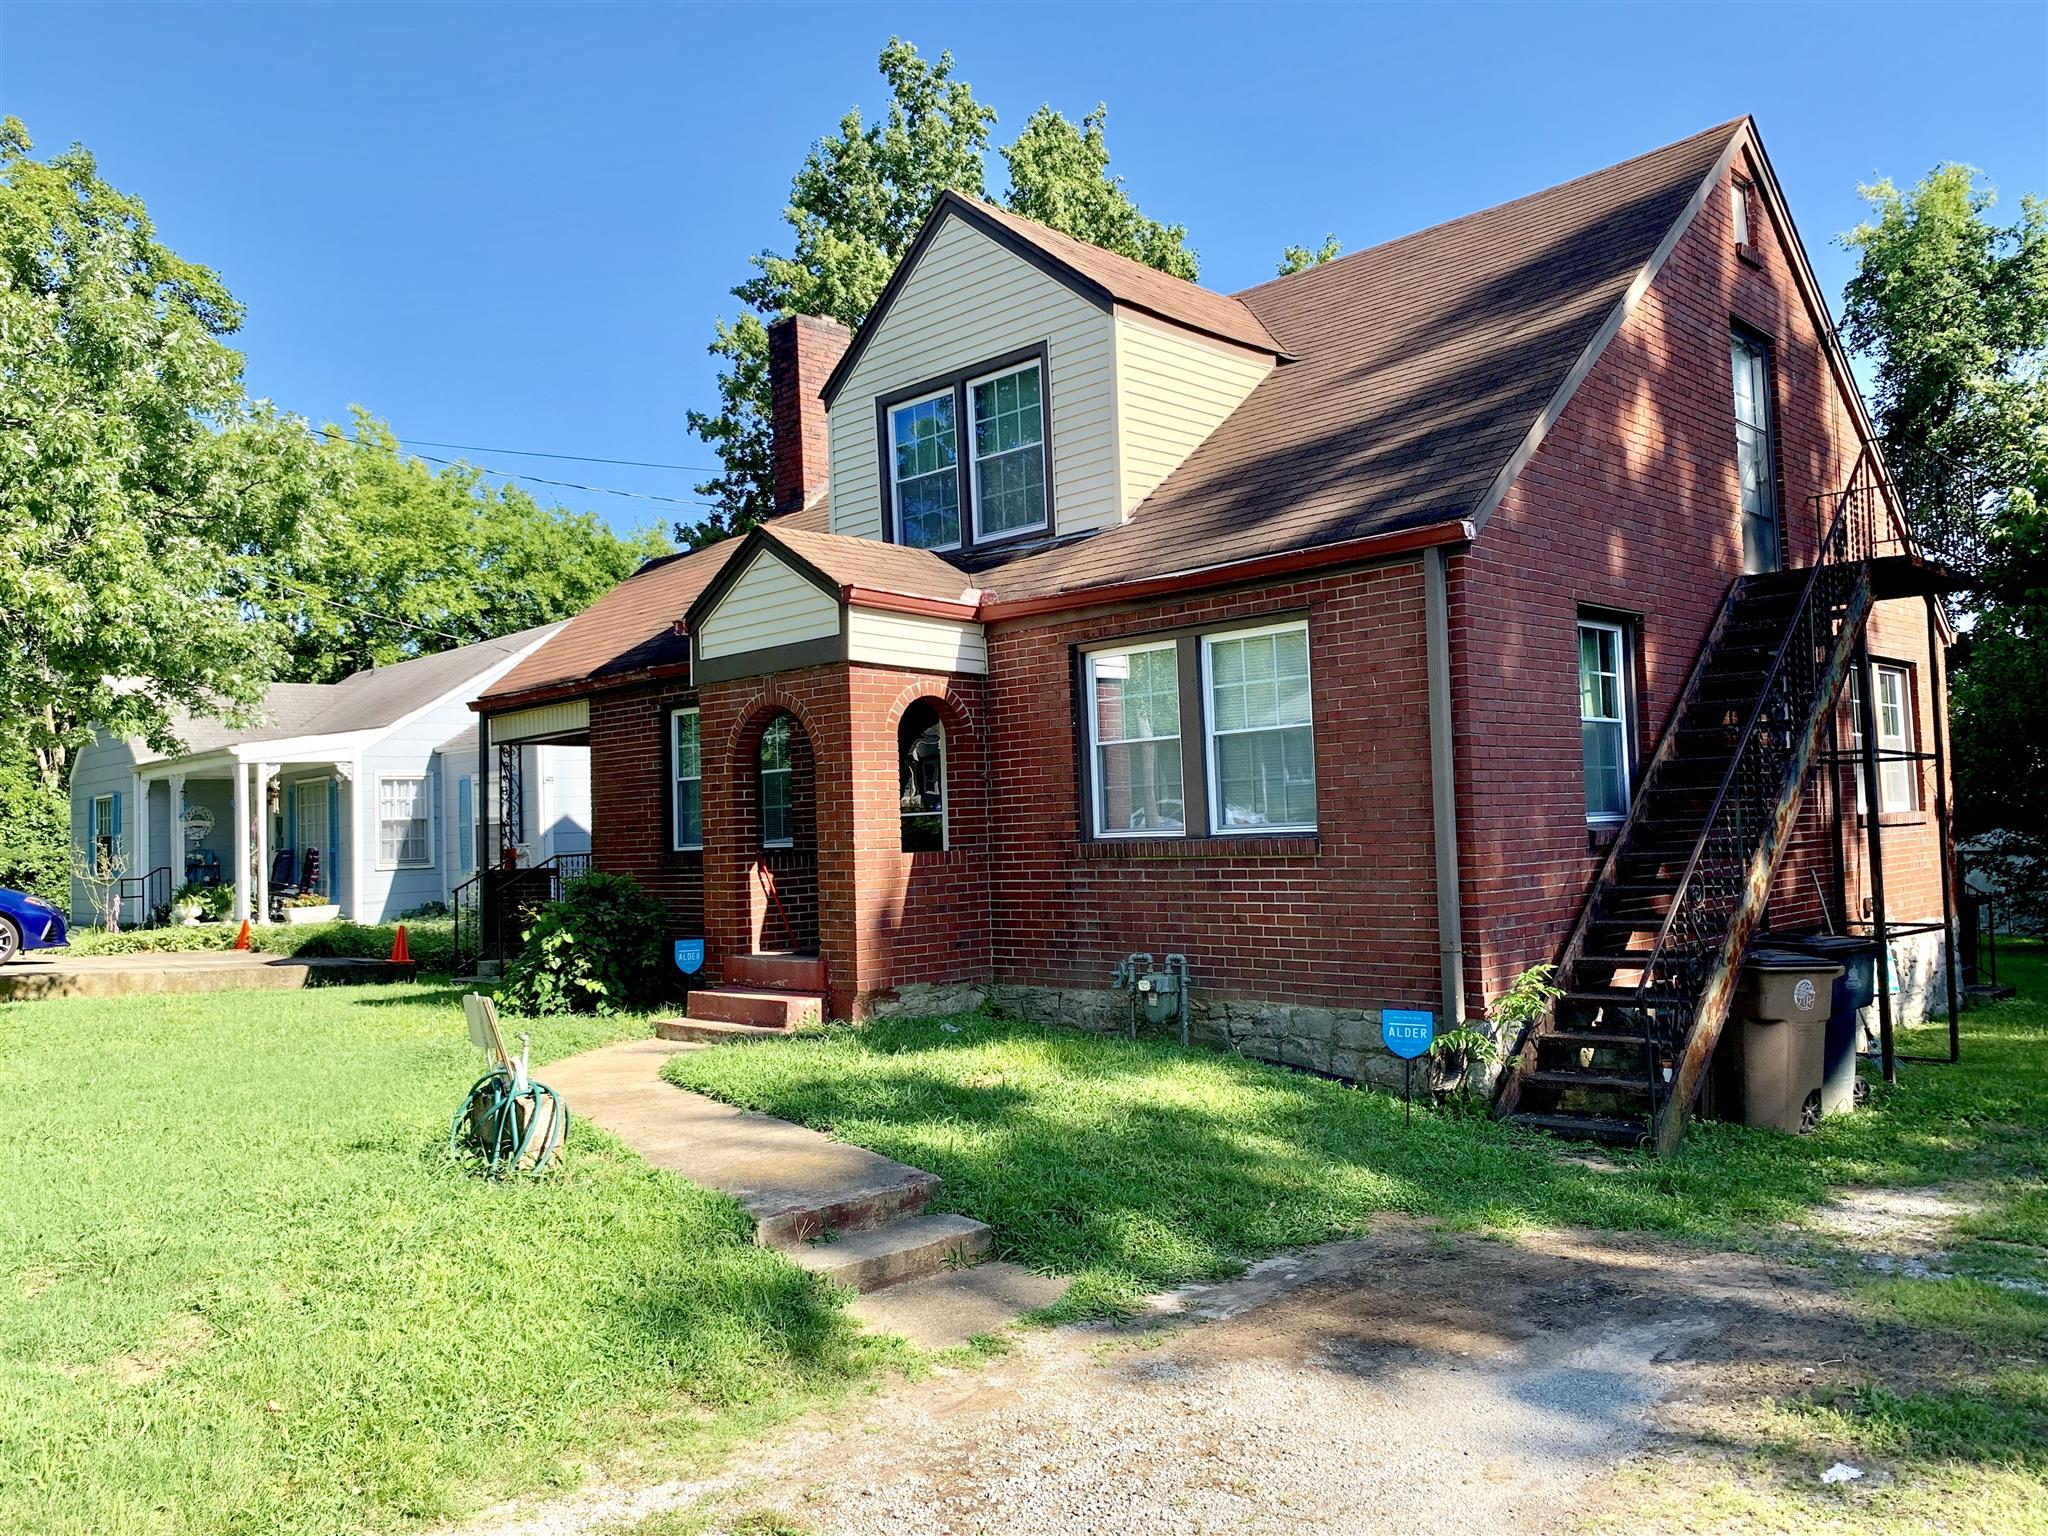 922 Oneida Ave, Nashville, TN 37207 - Nashville, TN real estate listing